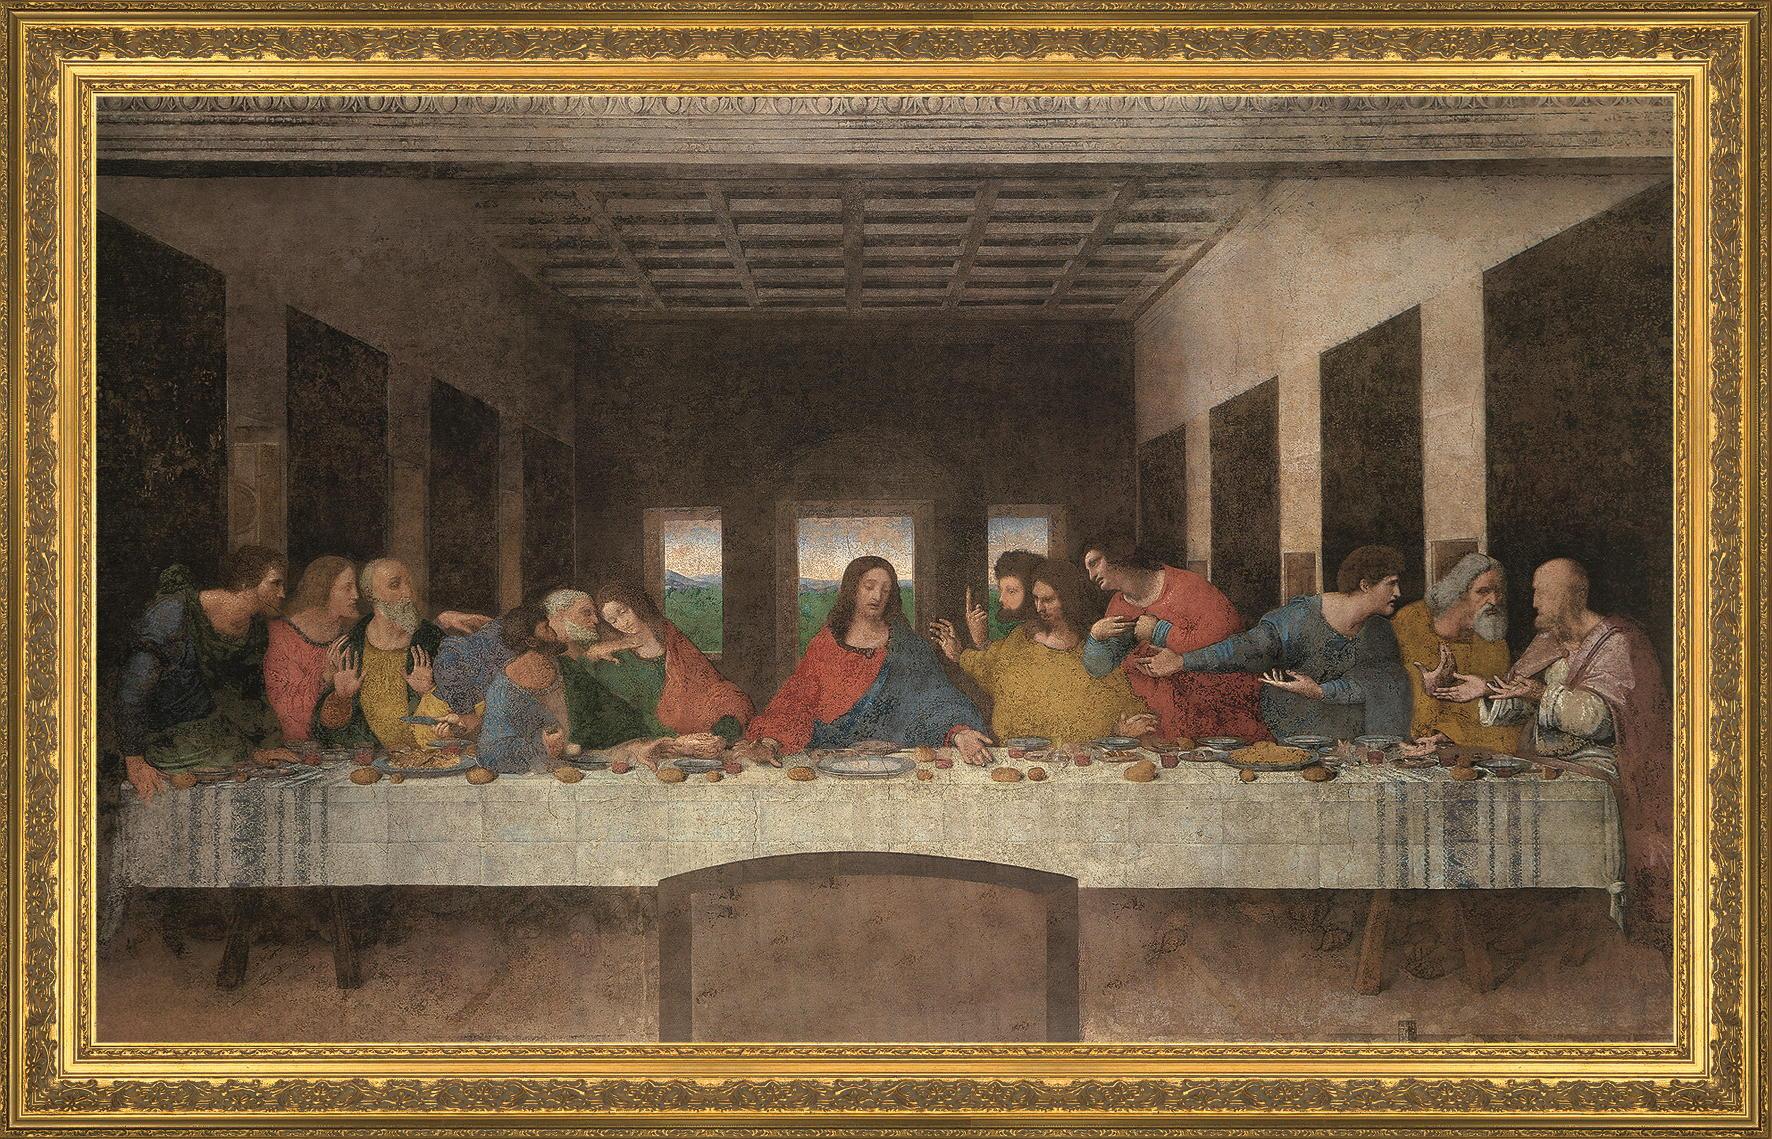 Das letzte Abendmahl (Leonardo da Vinci) von Leonardo da Vinci